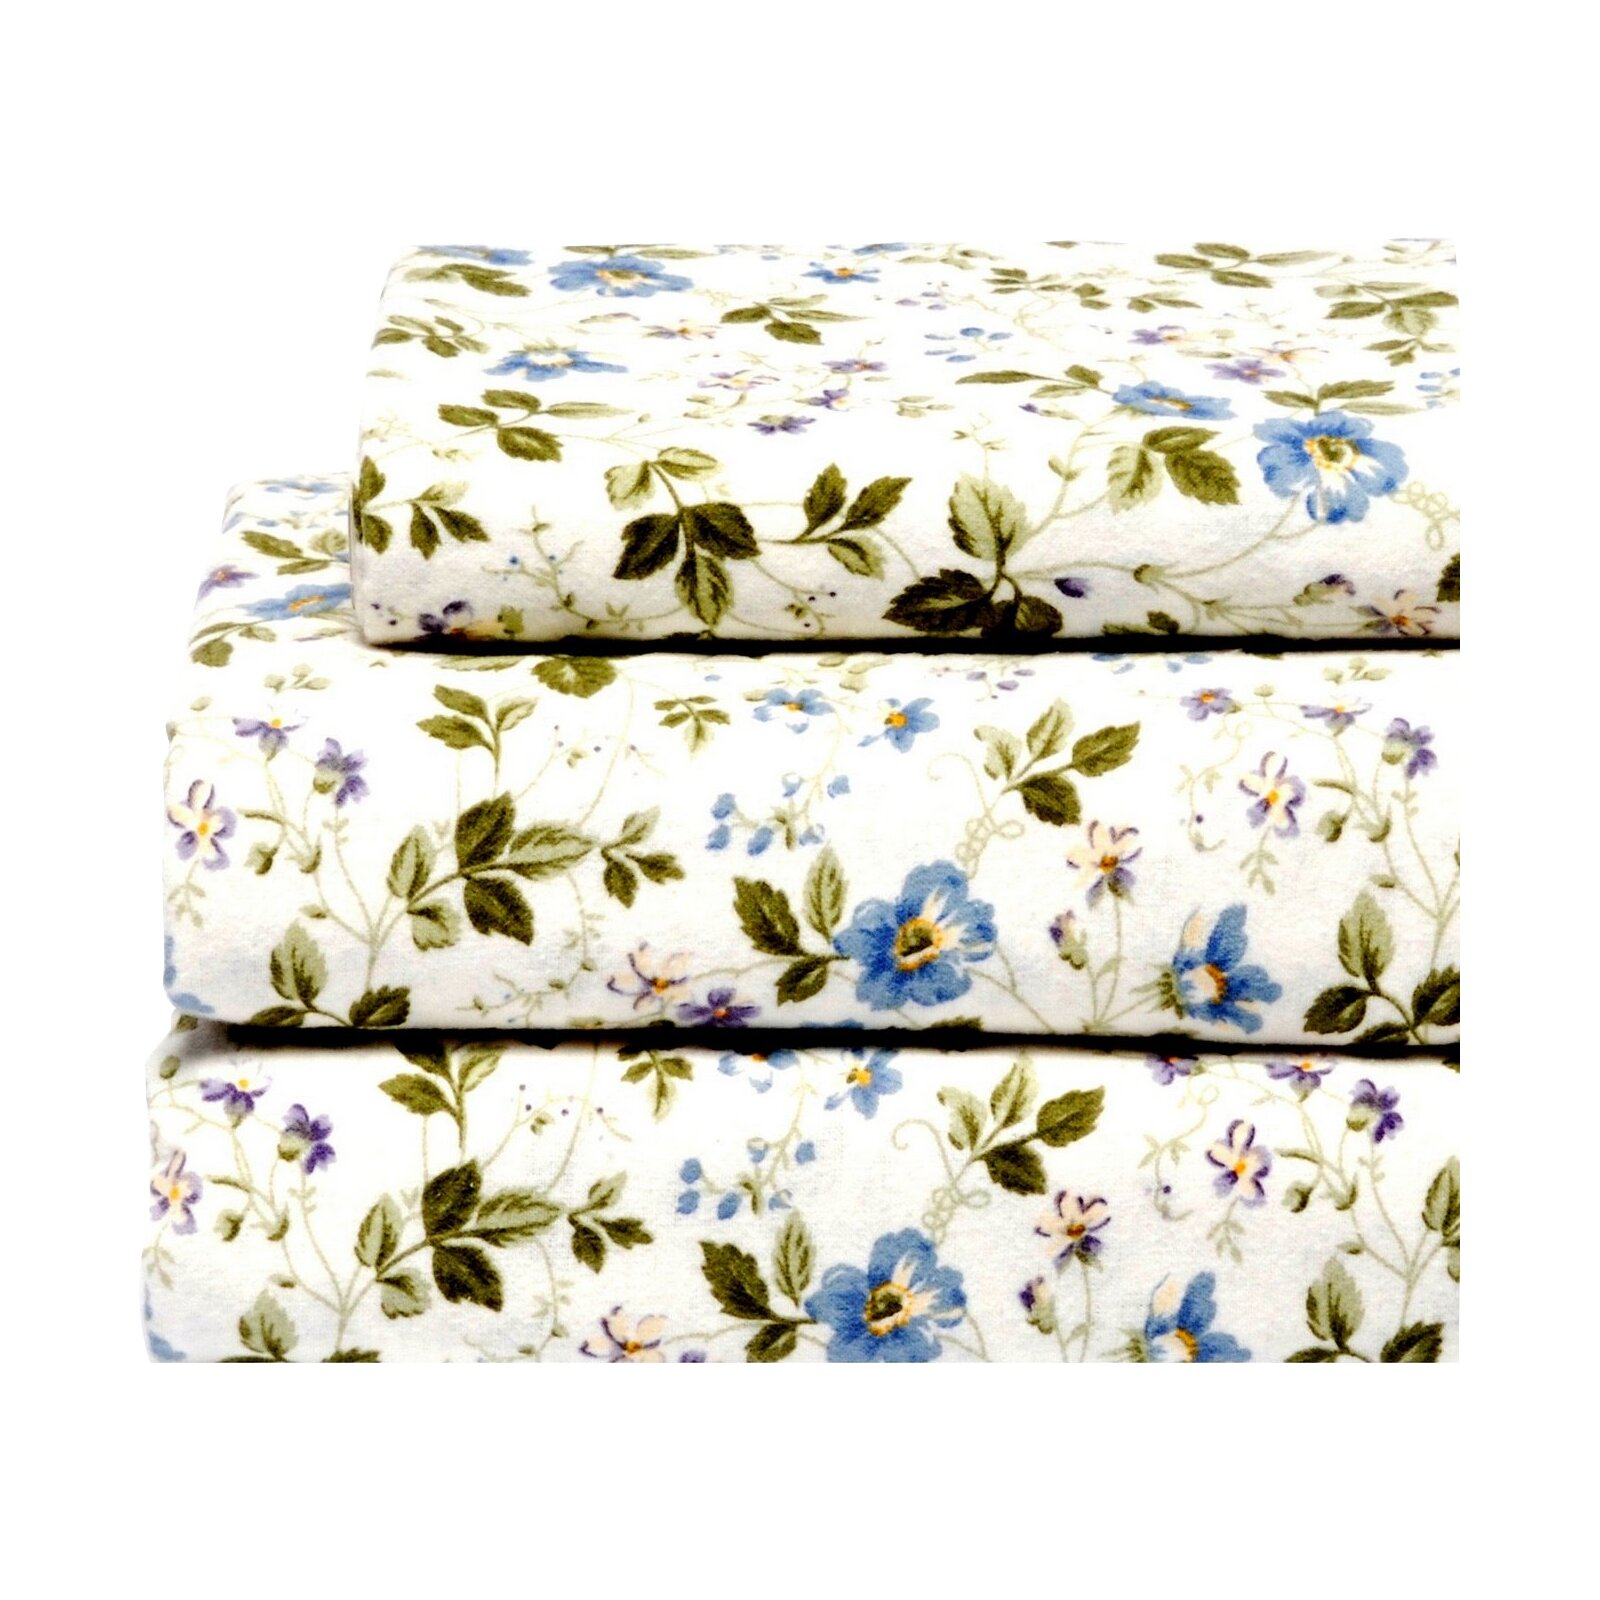 Laura Ashley Flannel Queen Sheet Set: Laura Ashley Home Spring Bloom Flannel 4 Piece Sheet Set